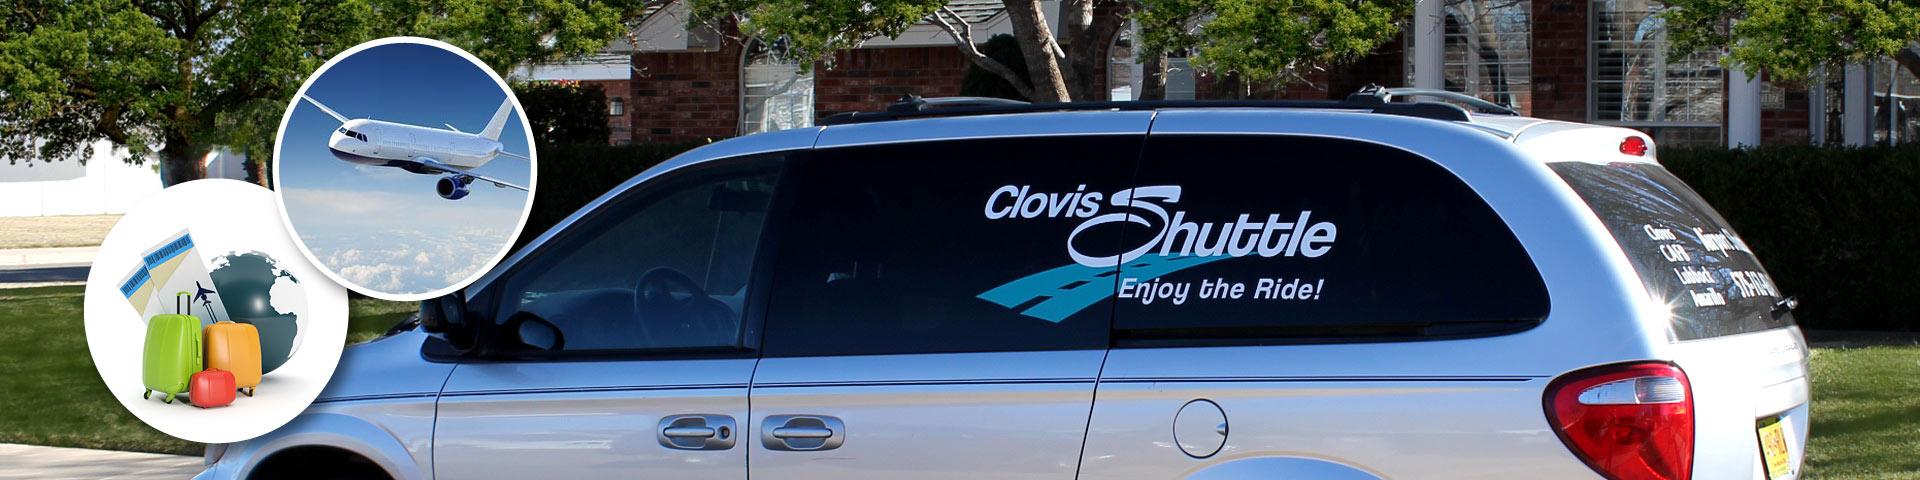 Clovis Shuttle